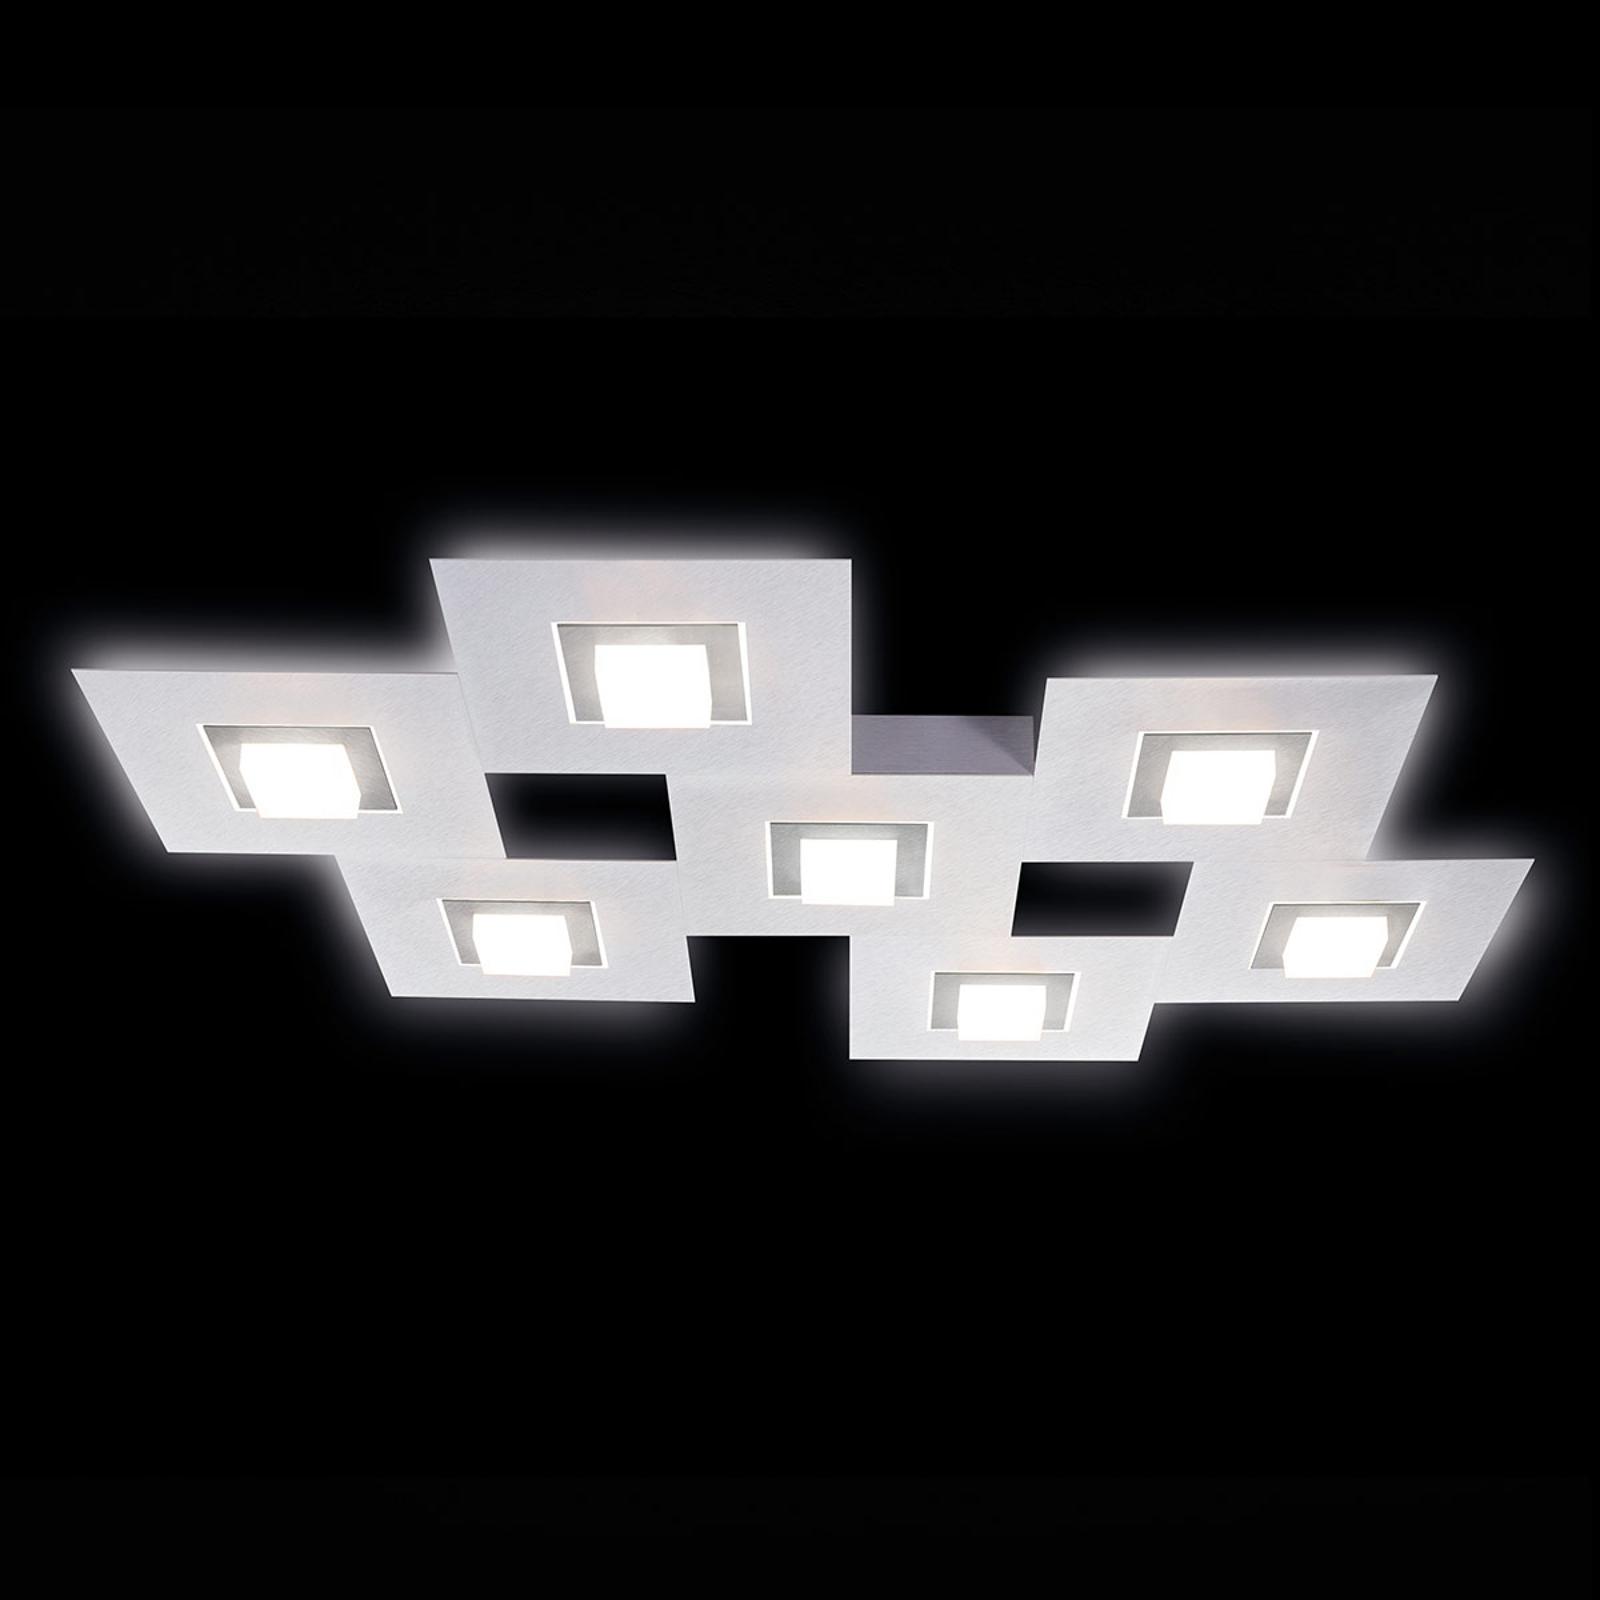 GROSSMANN Karree lampa sufitowa LED, 7-pkt. tytan